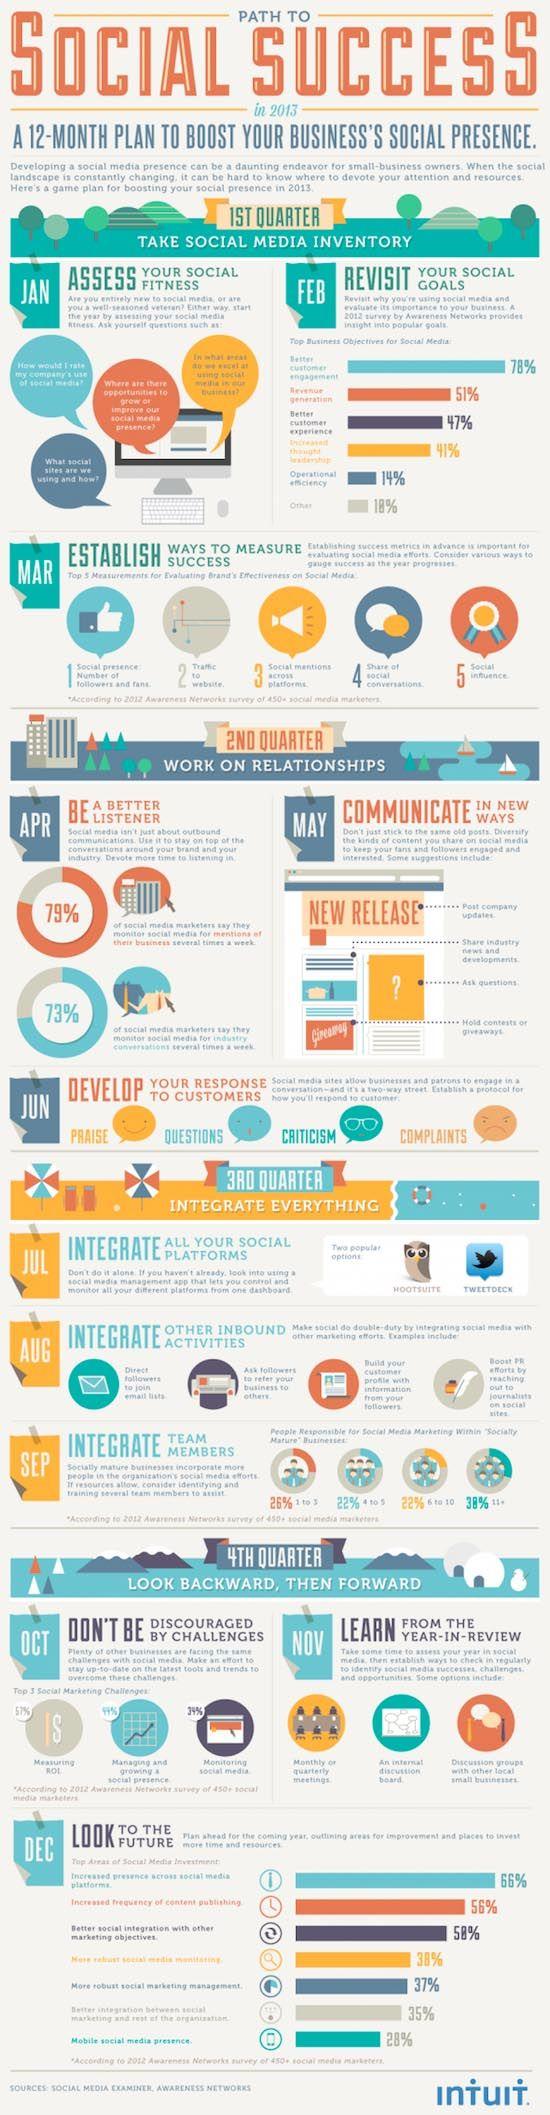 Social Media Strategy Template - Social Media Chimps